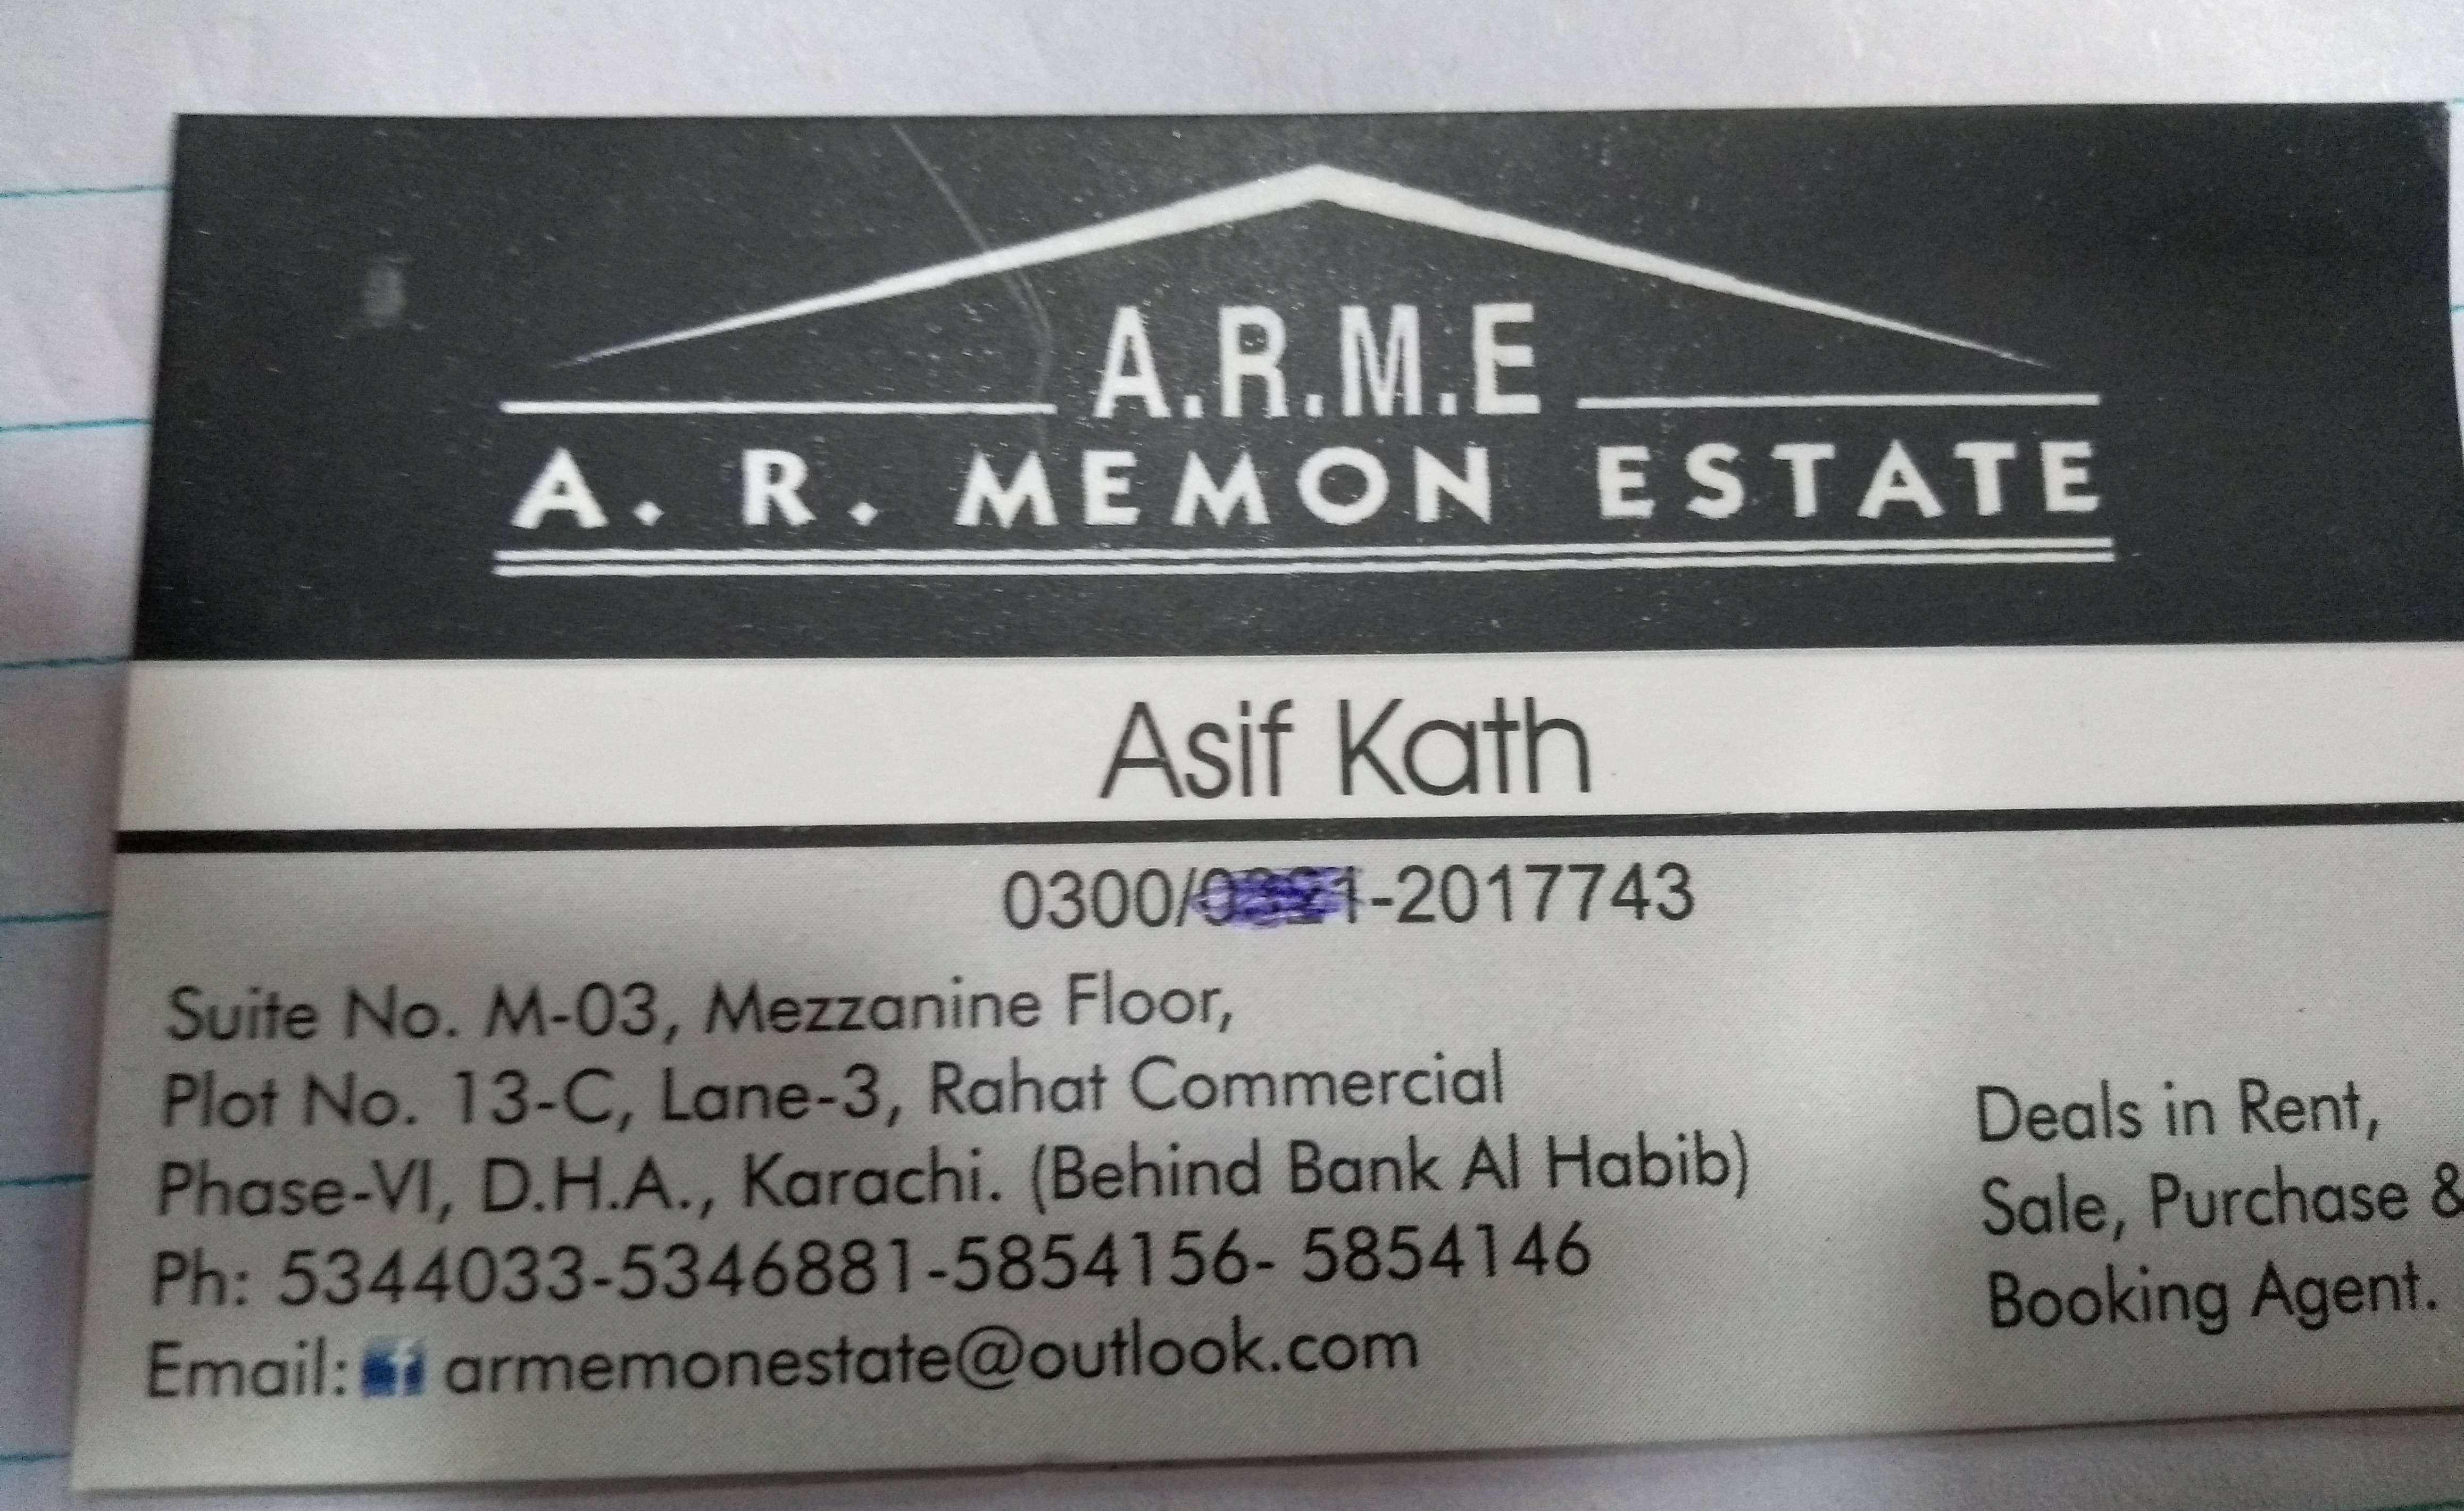 Asif Kath